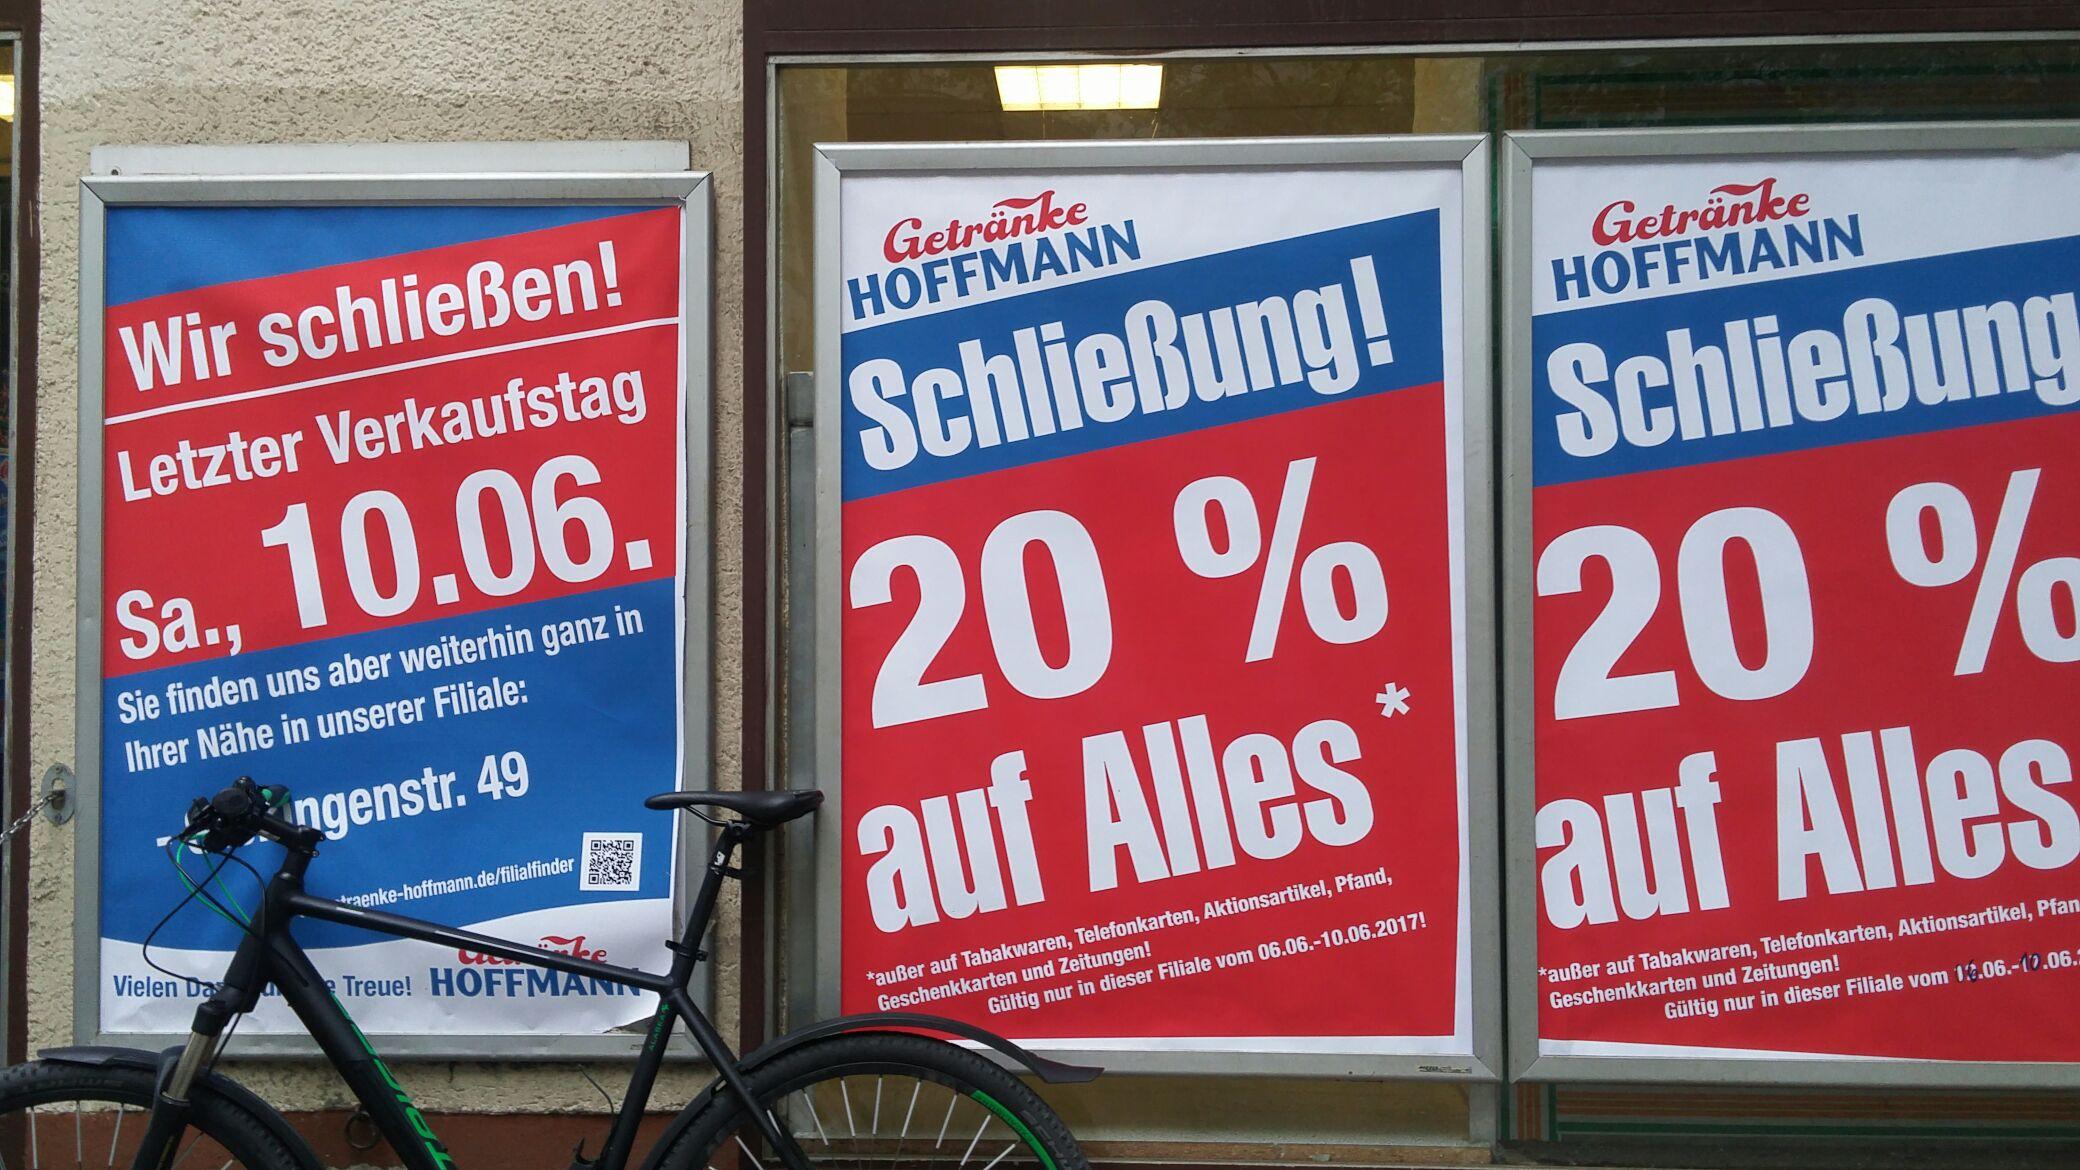 [Lokal Berlin] 20% auf alles bei Getränke Hoffmann Kaiserin-Augusta-Allee 88 (Mierendorffkiez)